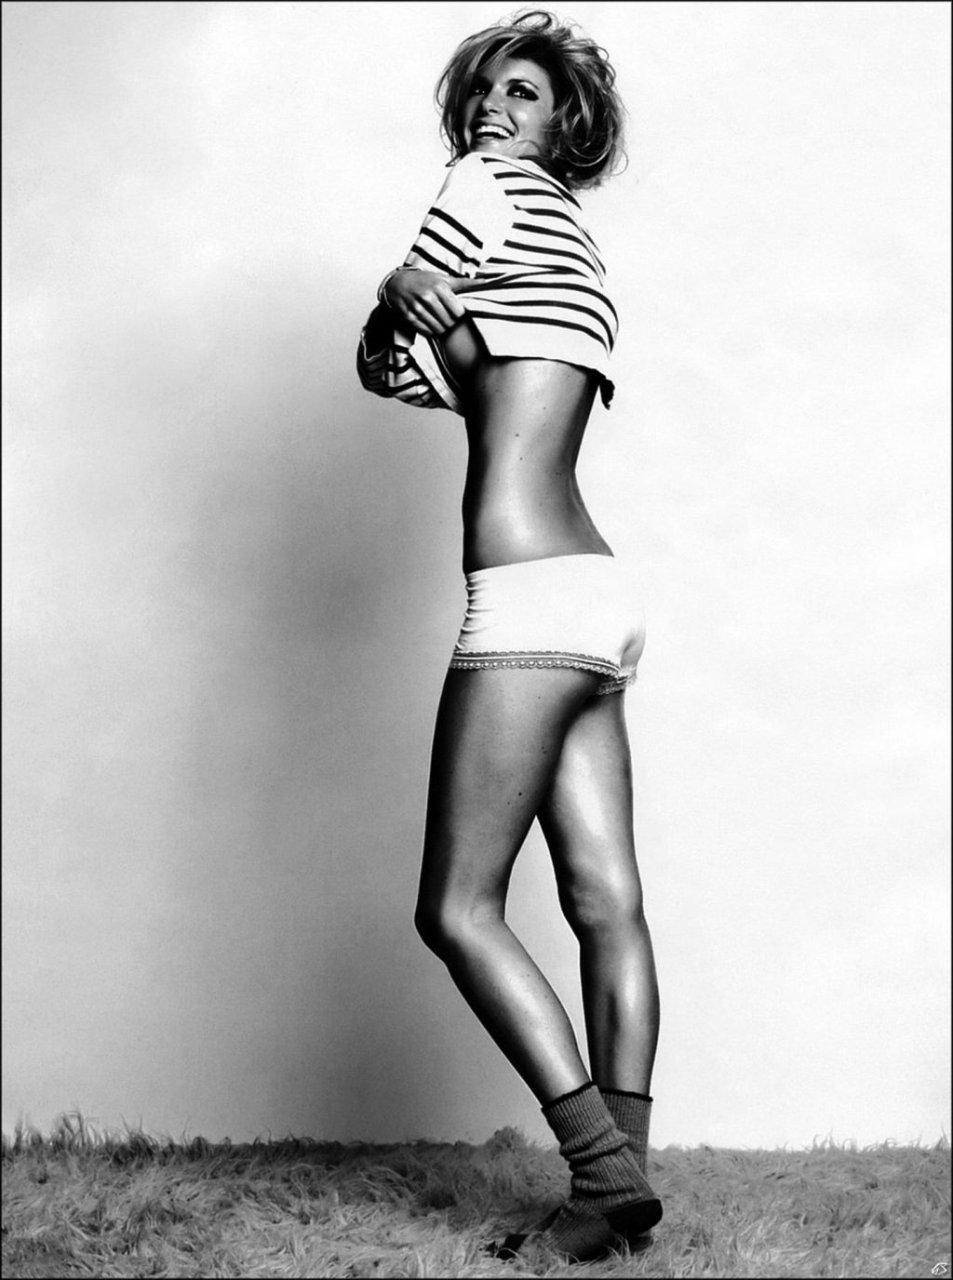 Marisa-Miller-Nude-TheFappeningBlog.com-36-1024x1375.jpg